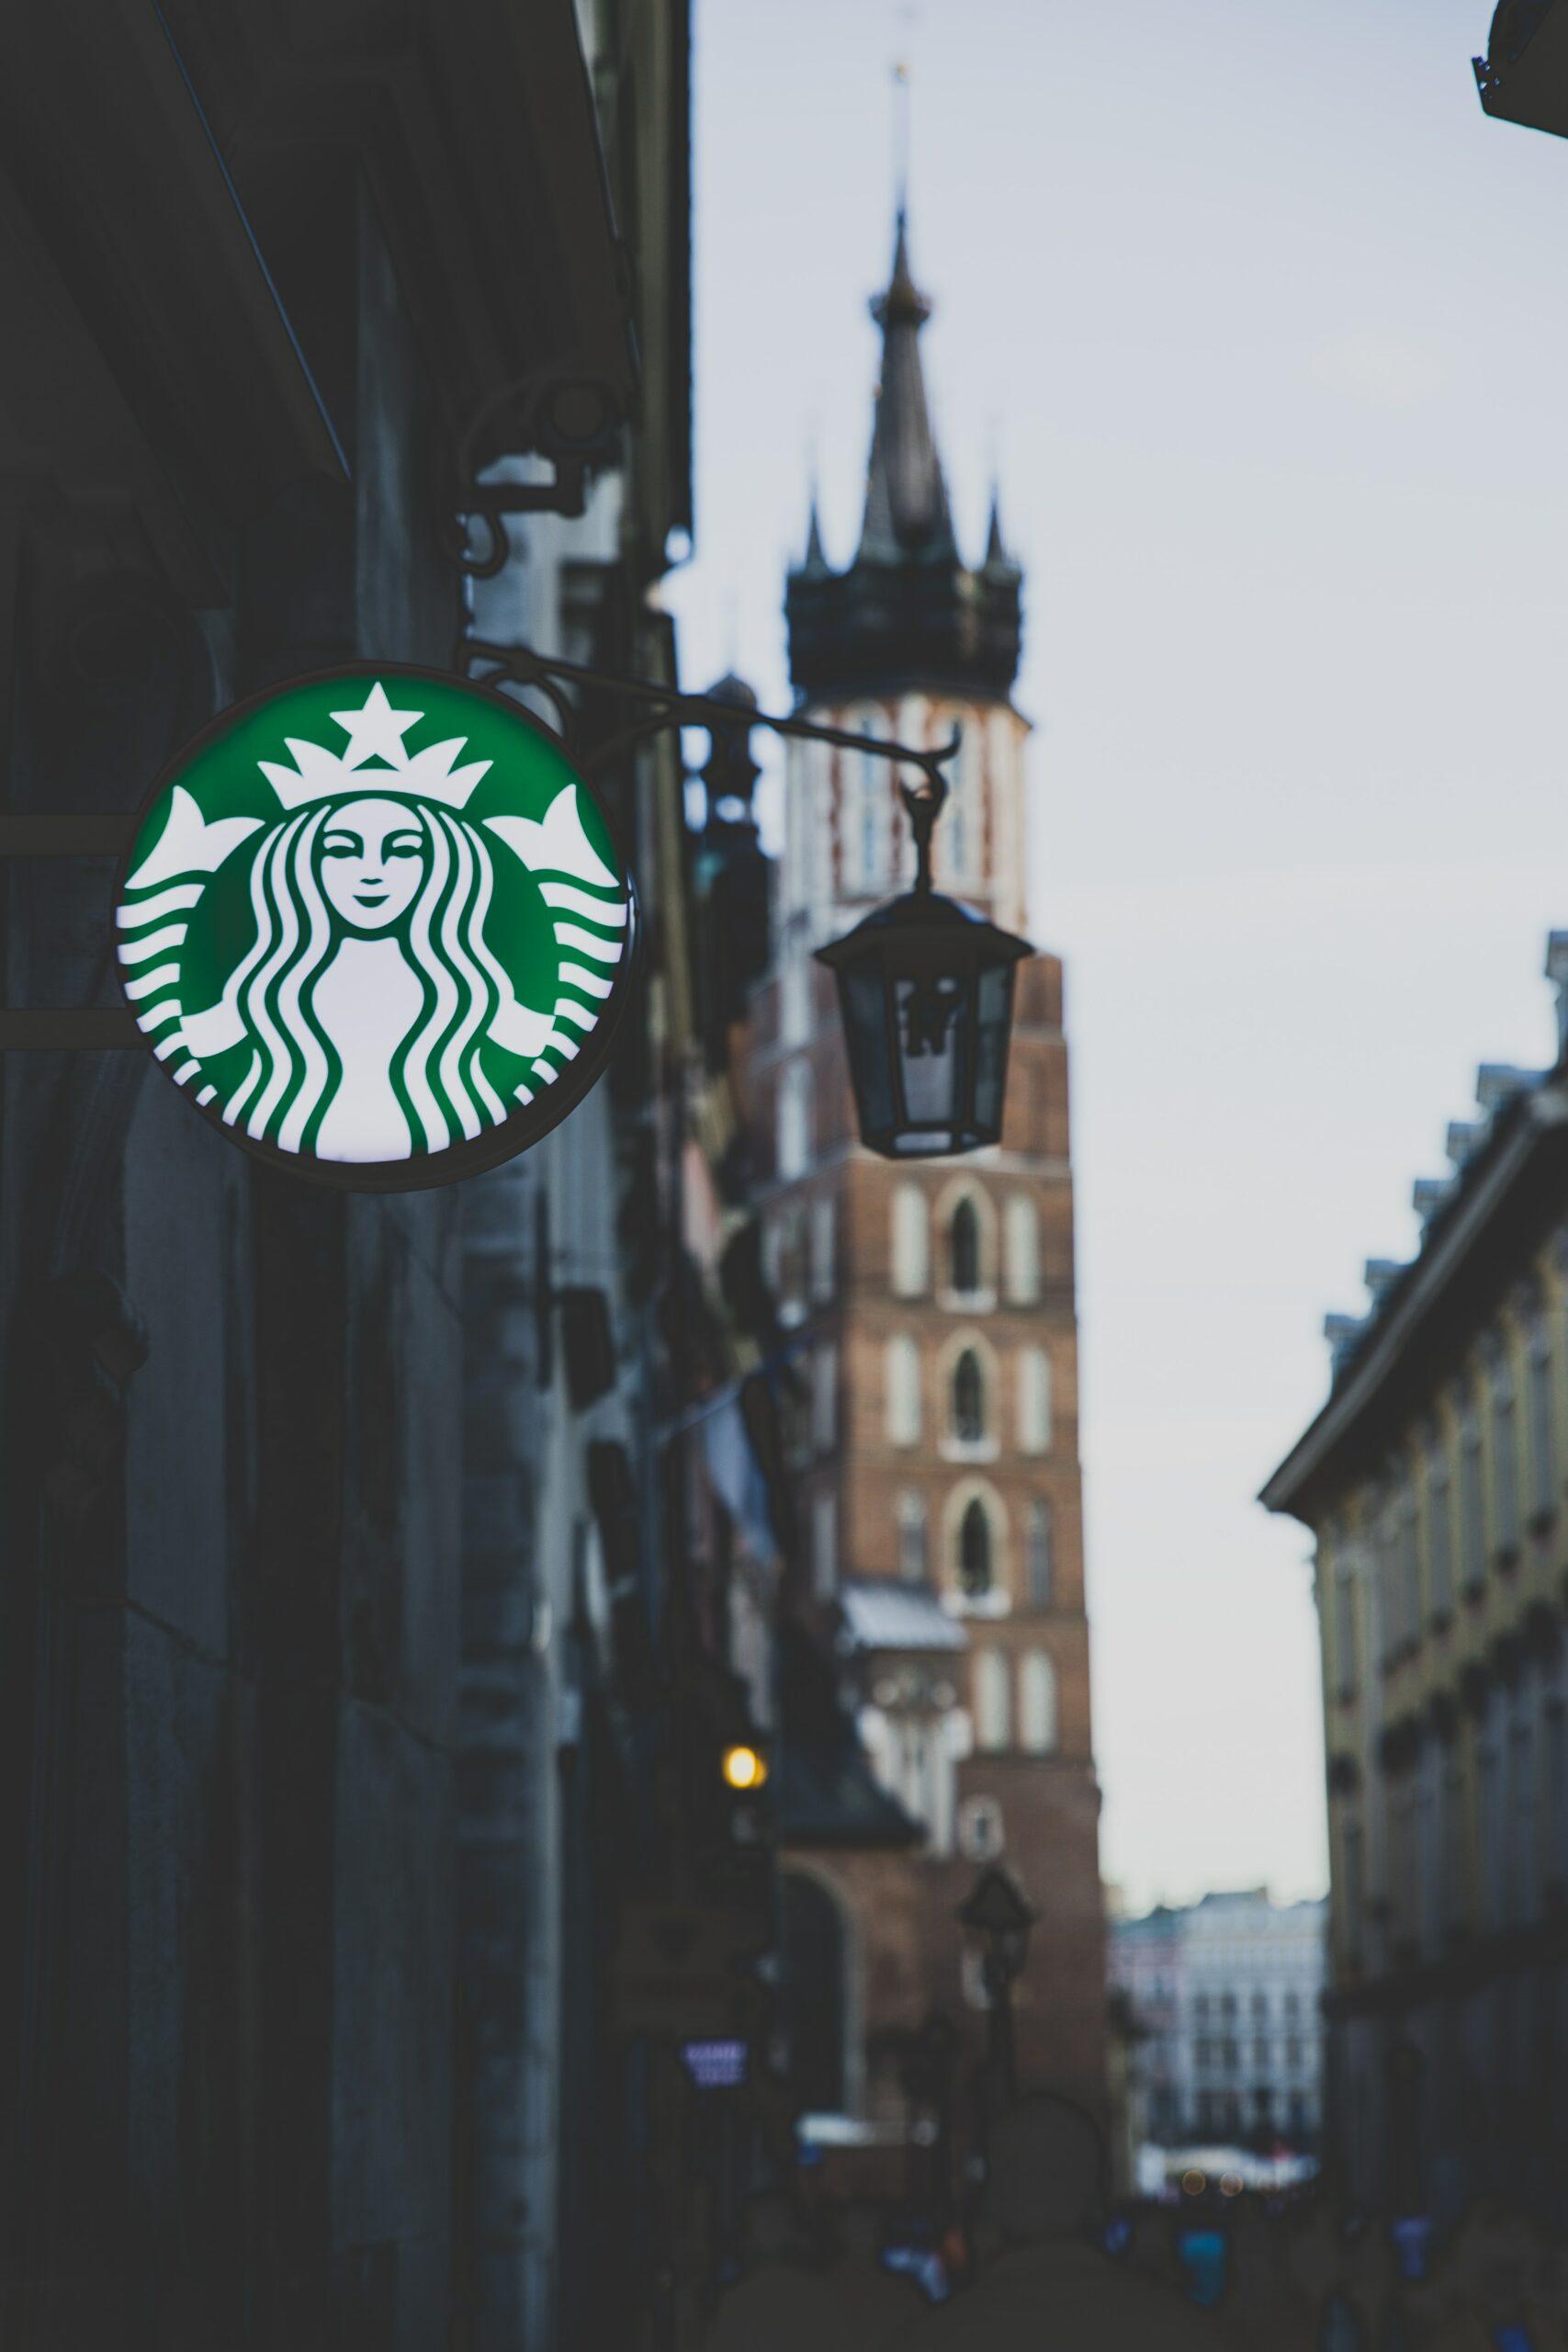 Sustainable Tourism - The lure of Chain stores - Starbucks McDonalds - Travelblog TravelRebel